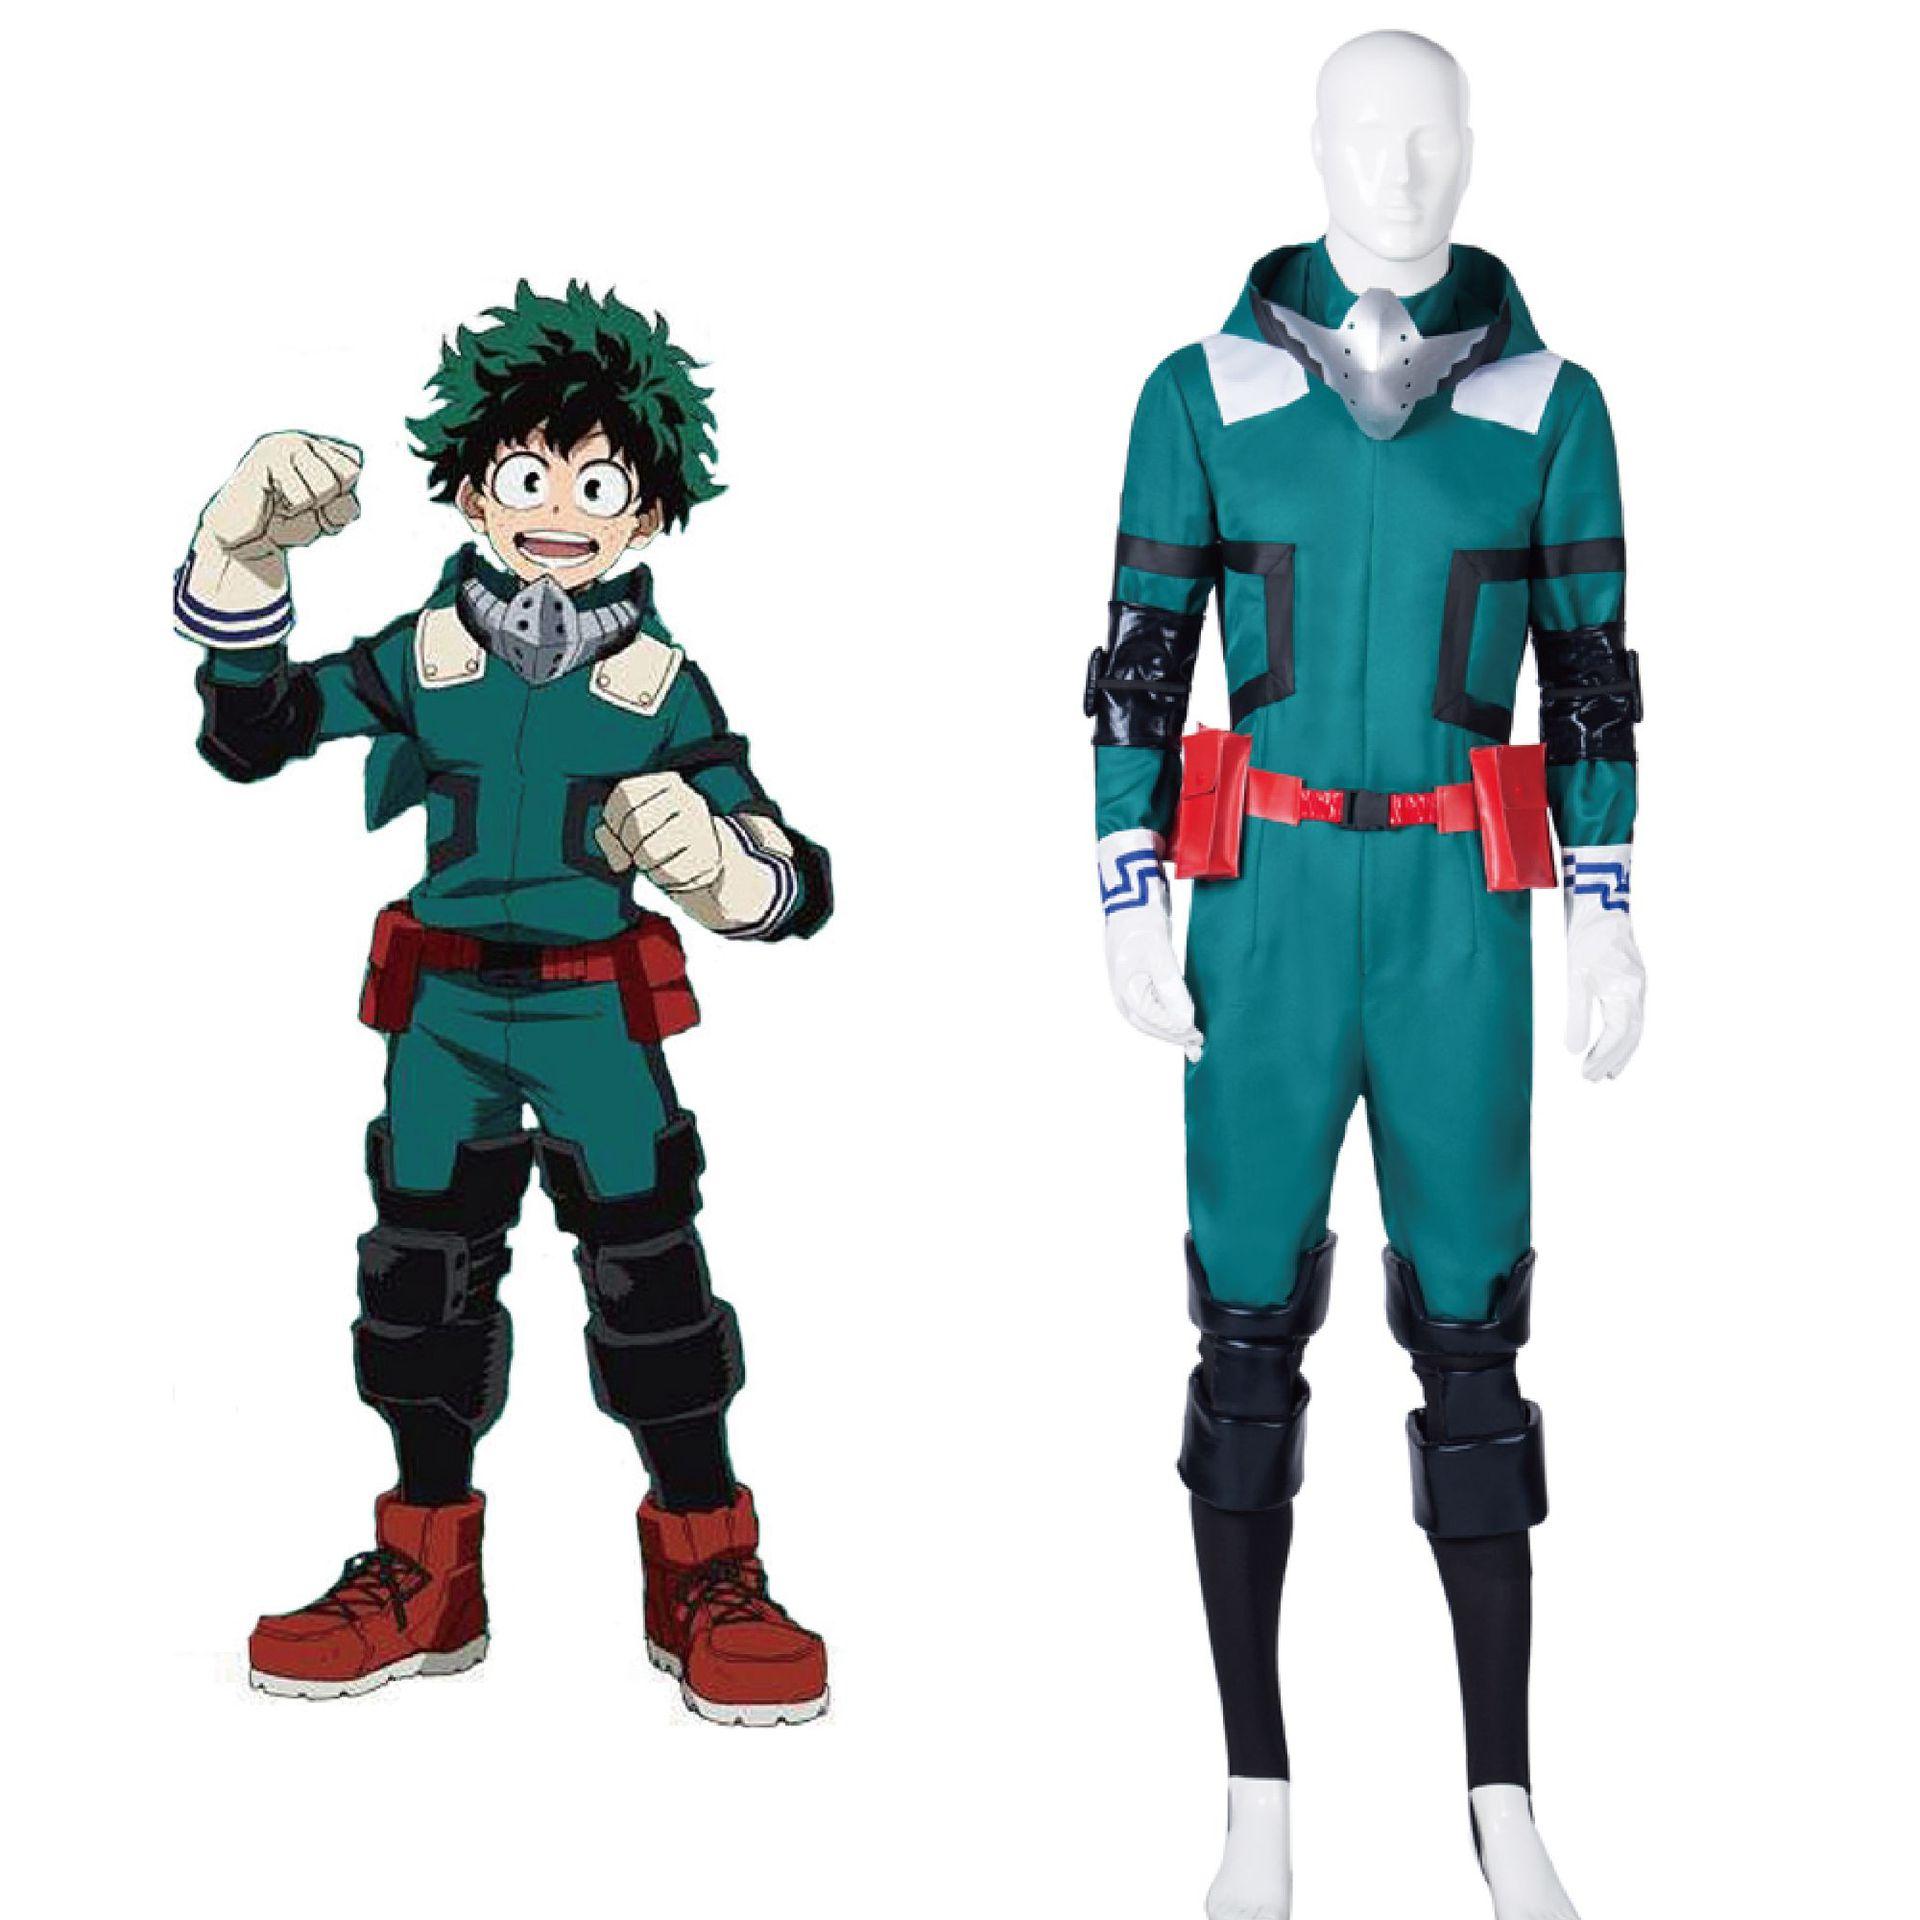 Anime mon héros académique Boku pas de héros académique Midoriya Izuku Deku Cosplay Costume combat Costume hommes combinaison carnaval ensemble complet